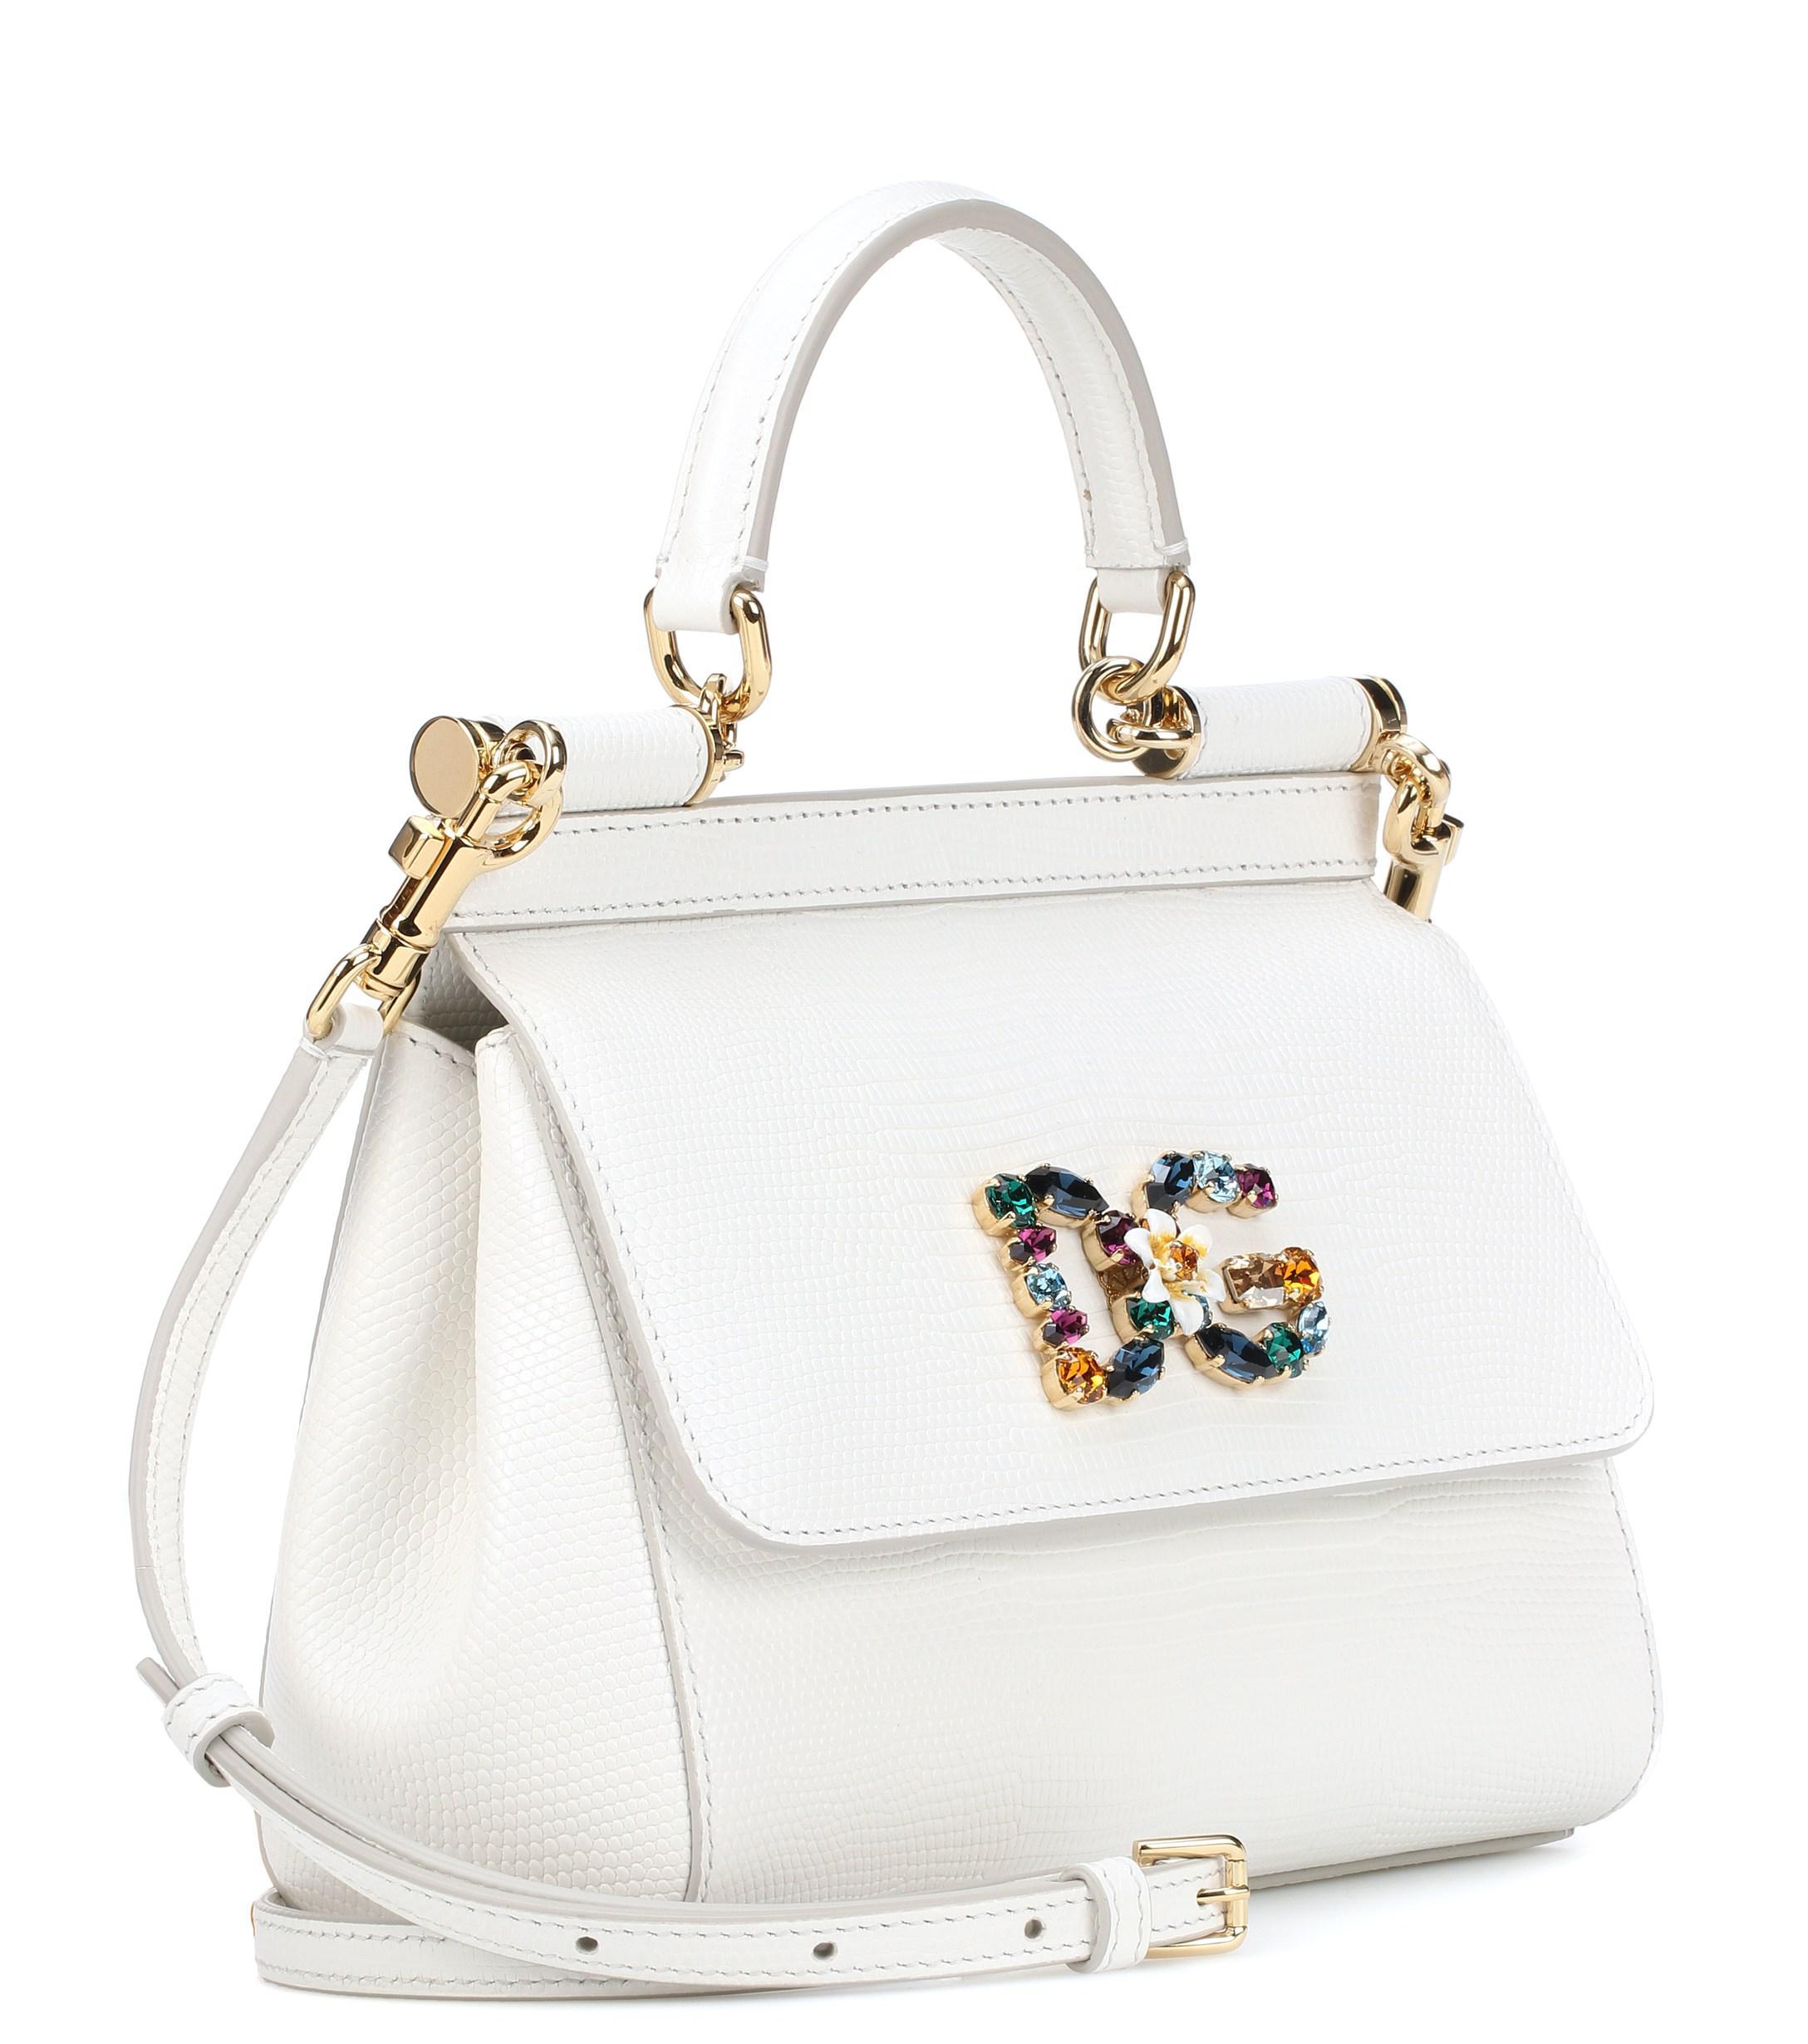 1ff53ff2e7f Leather Shoulder Bag - Lyst. View fullscreen. Dolce & Gabbana ...